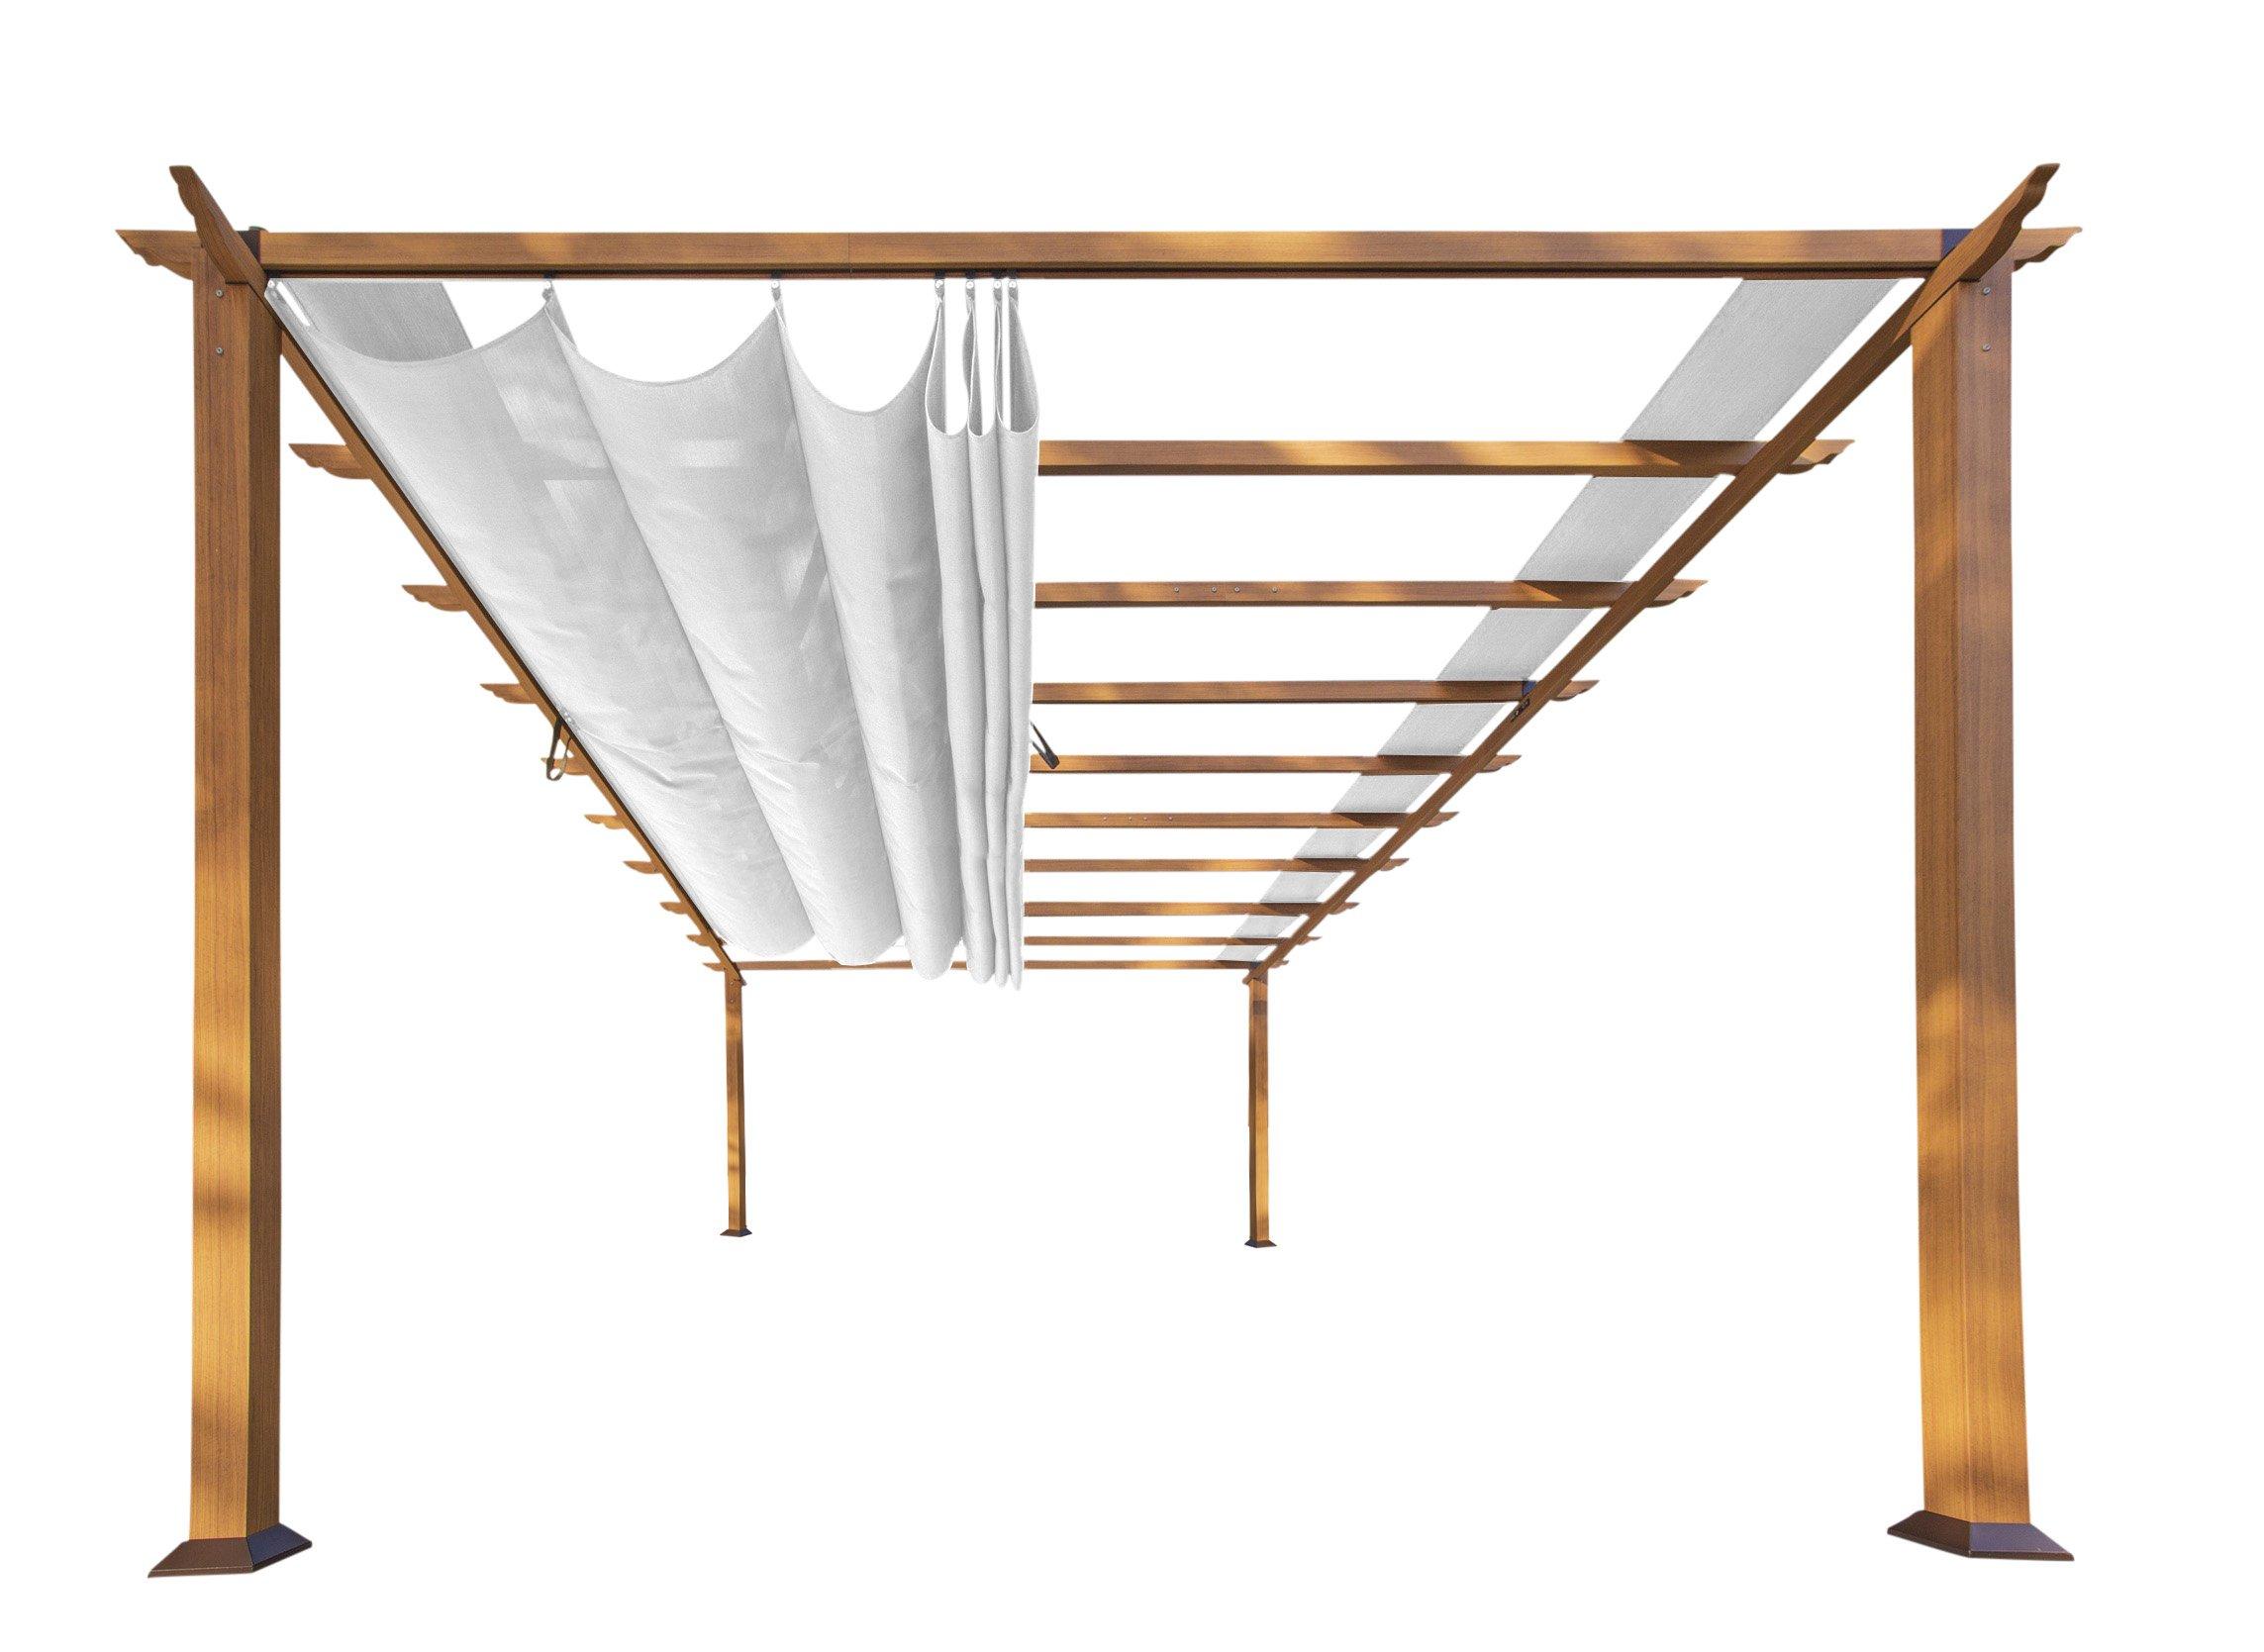 Paragon Outdoor PR16WD1W 11 x 16 ft. Verona Aluminum Pergola (Canadian Wood/Off White Canopy)